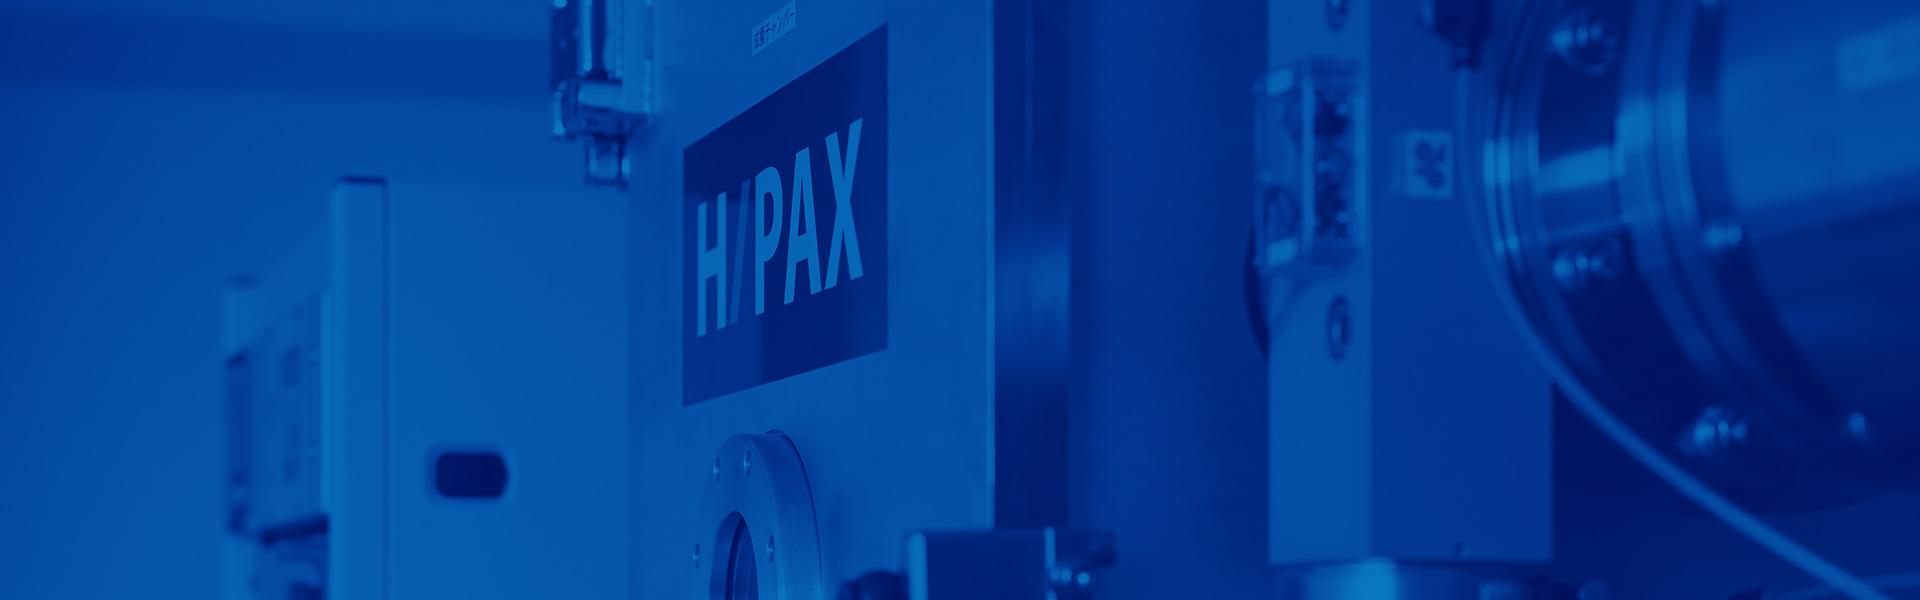 【HIPAX】製品